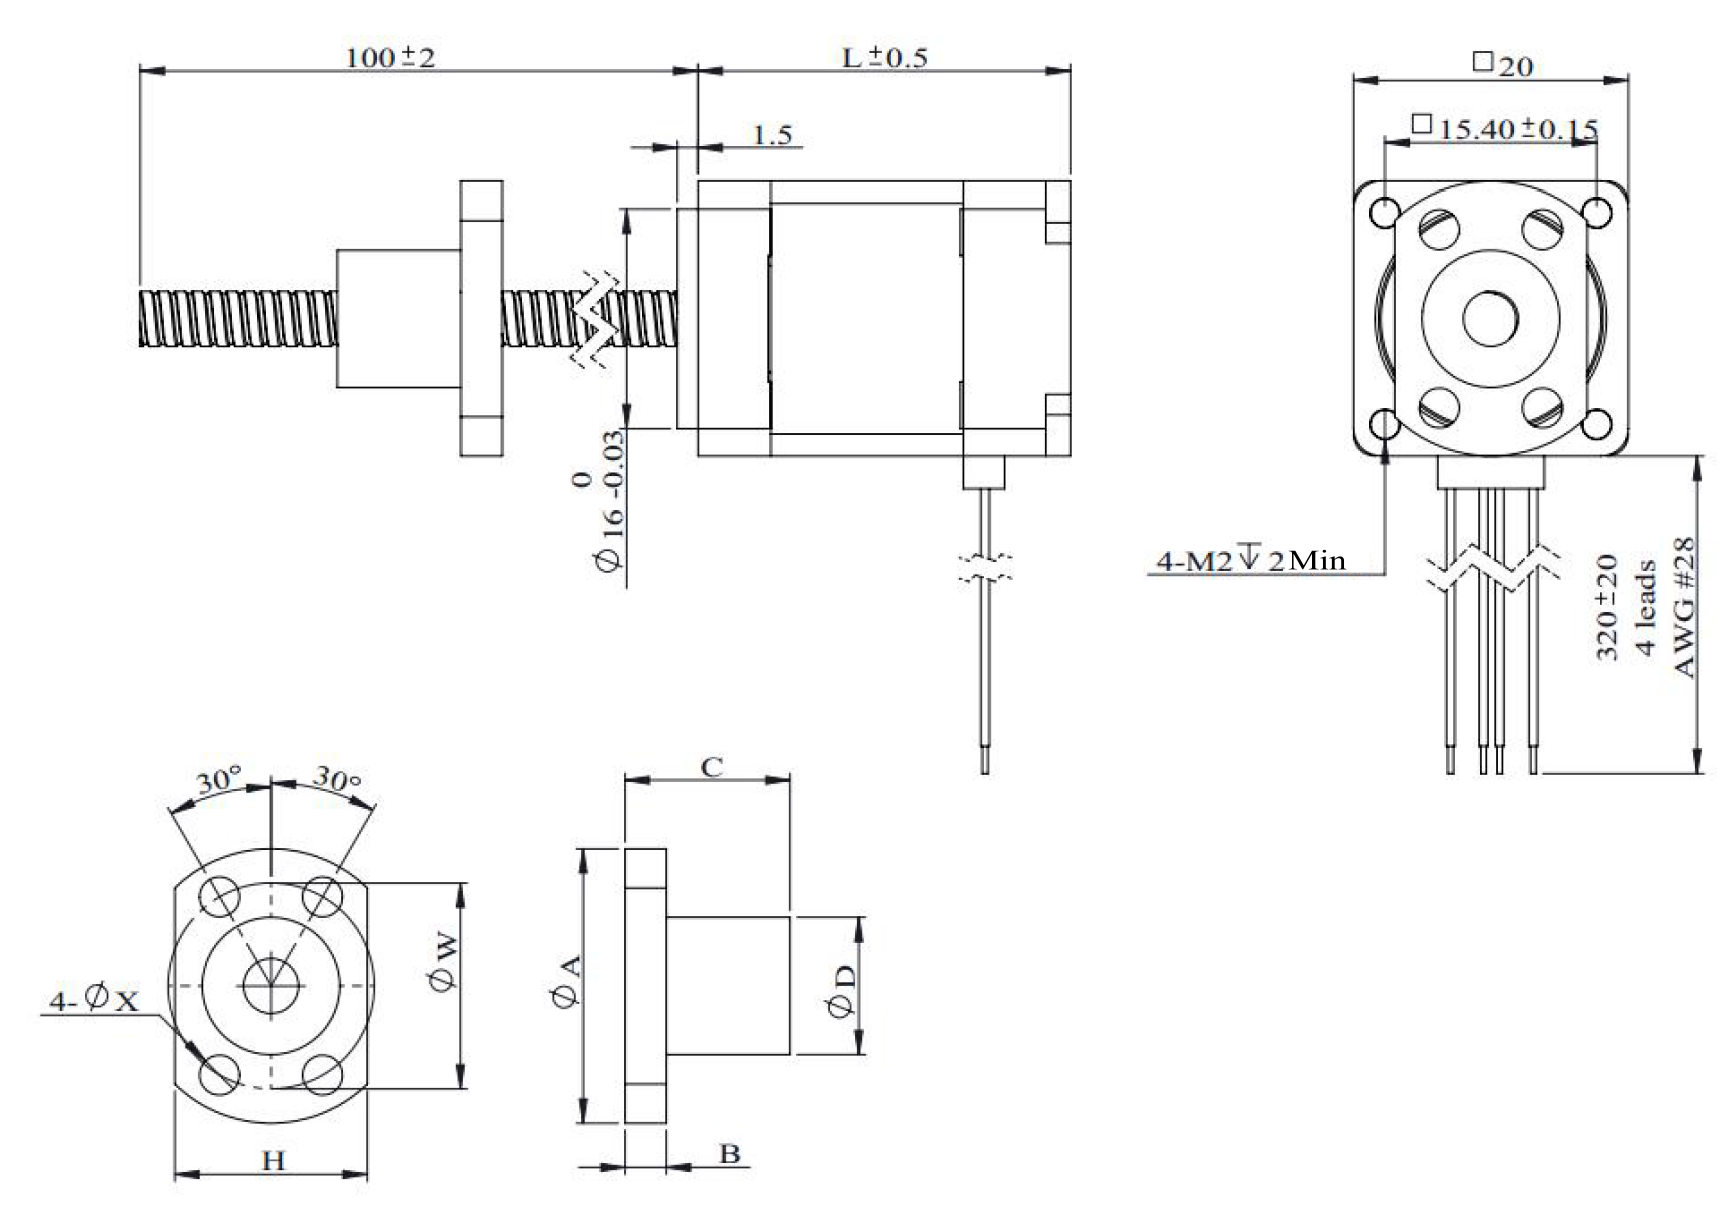 NEMA 8 Ball Screw Actuator Drawing